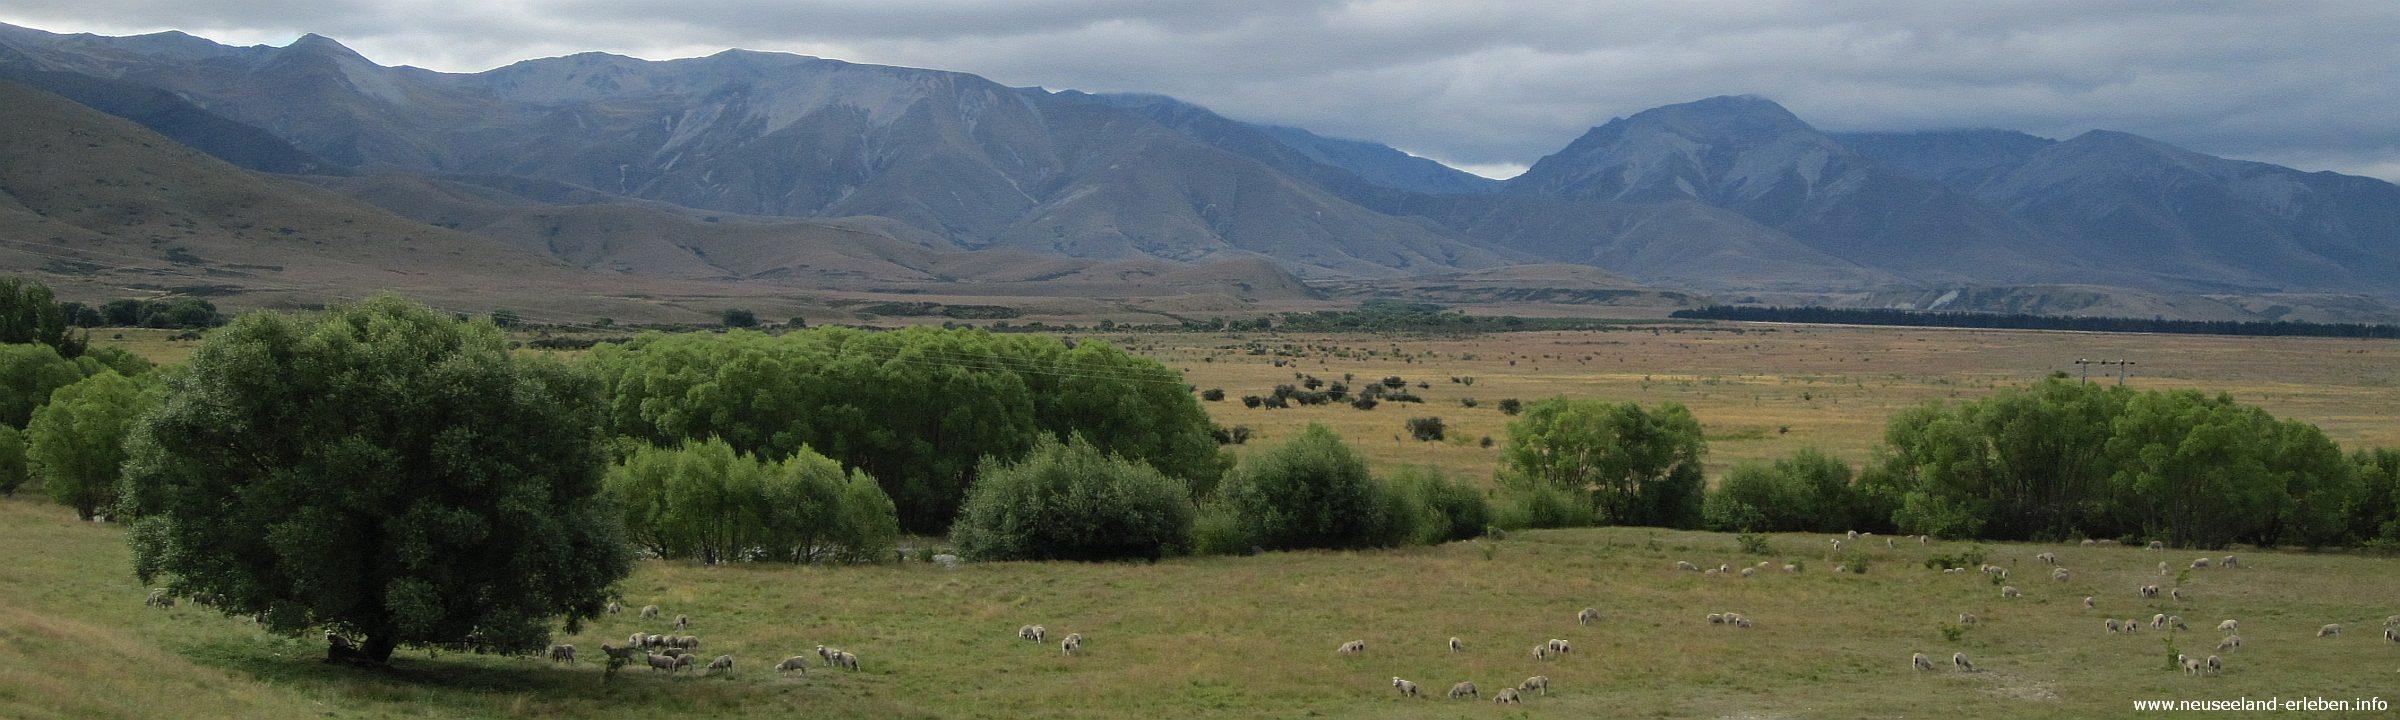 45 Tage Neuseeland – So viele Ziele, so wenig Zeit